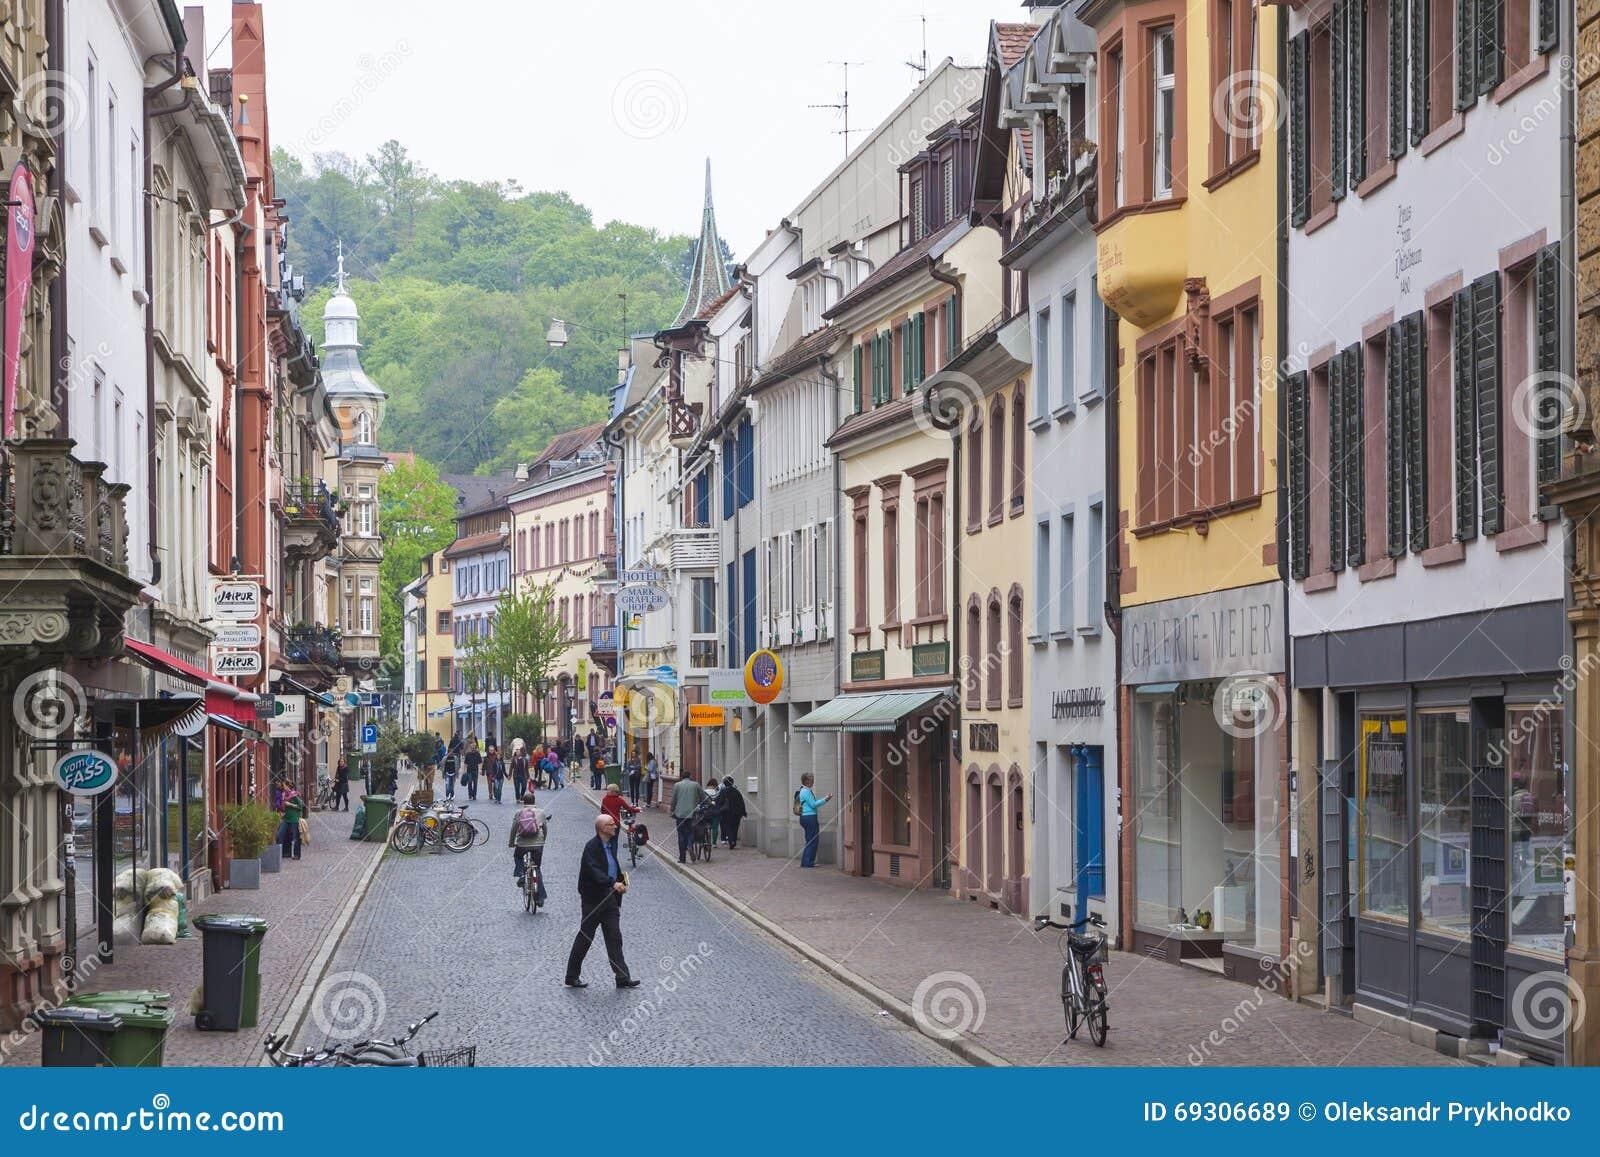 Old Town Street In Freiburg Im Breisgau City Germany